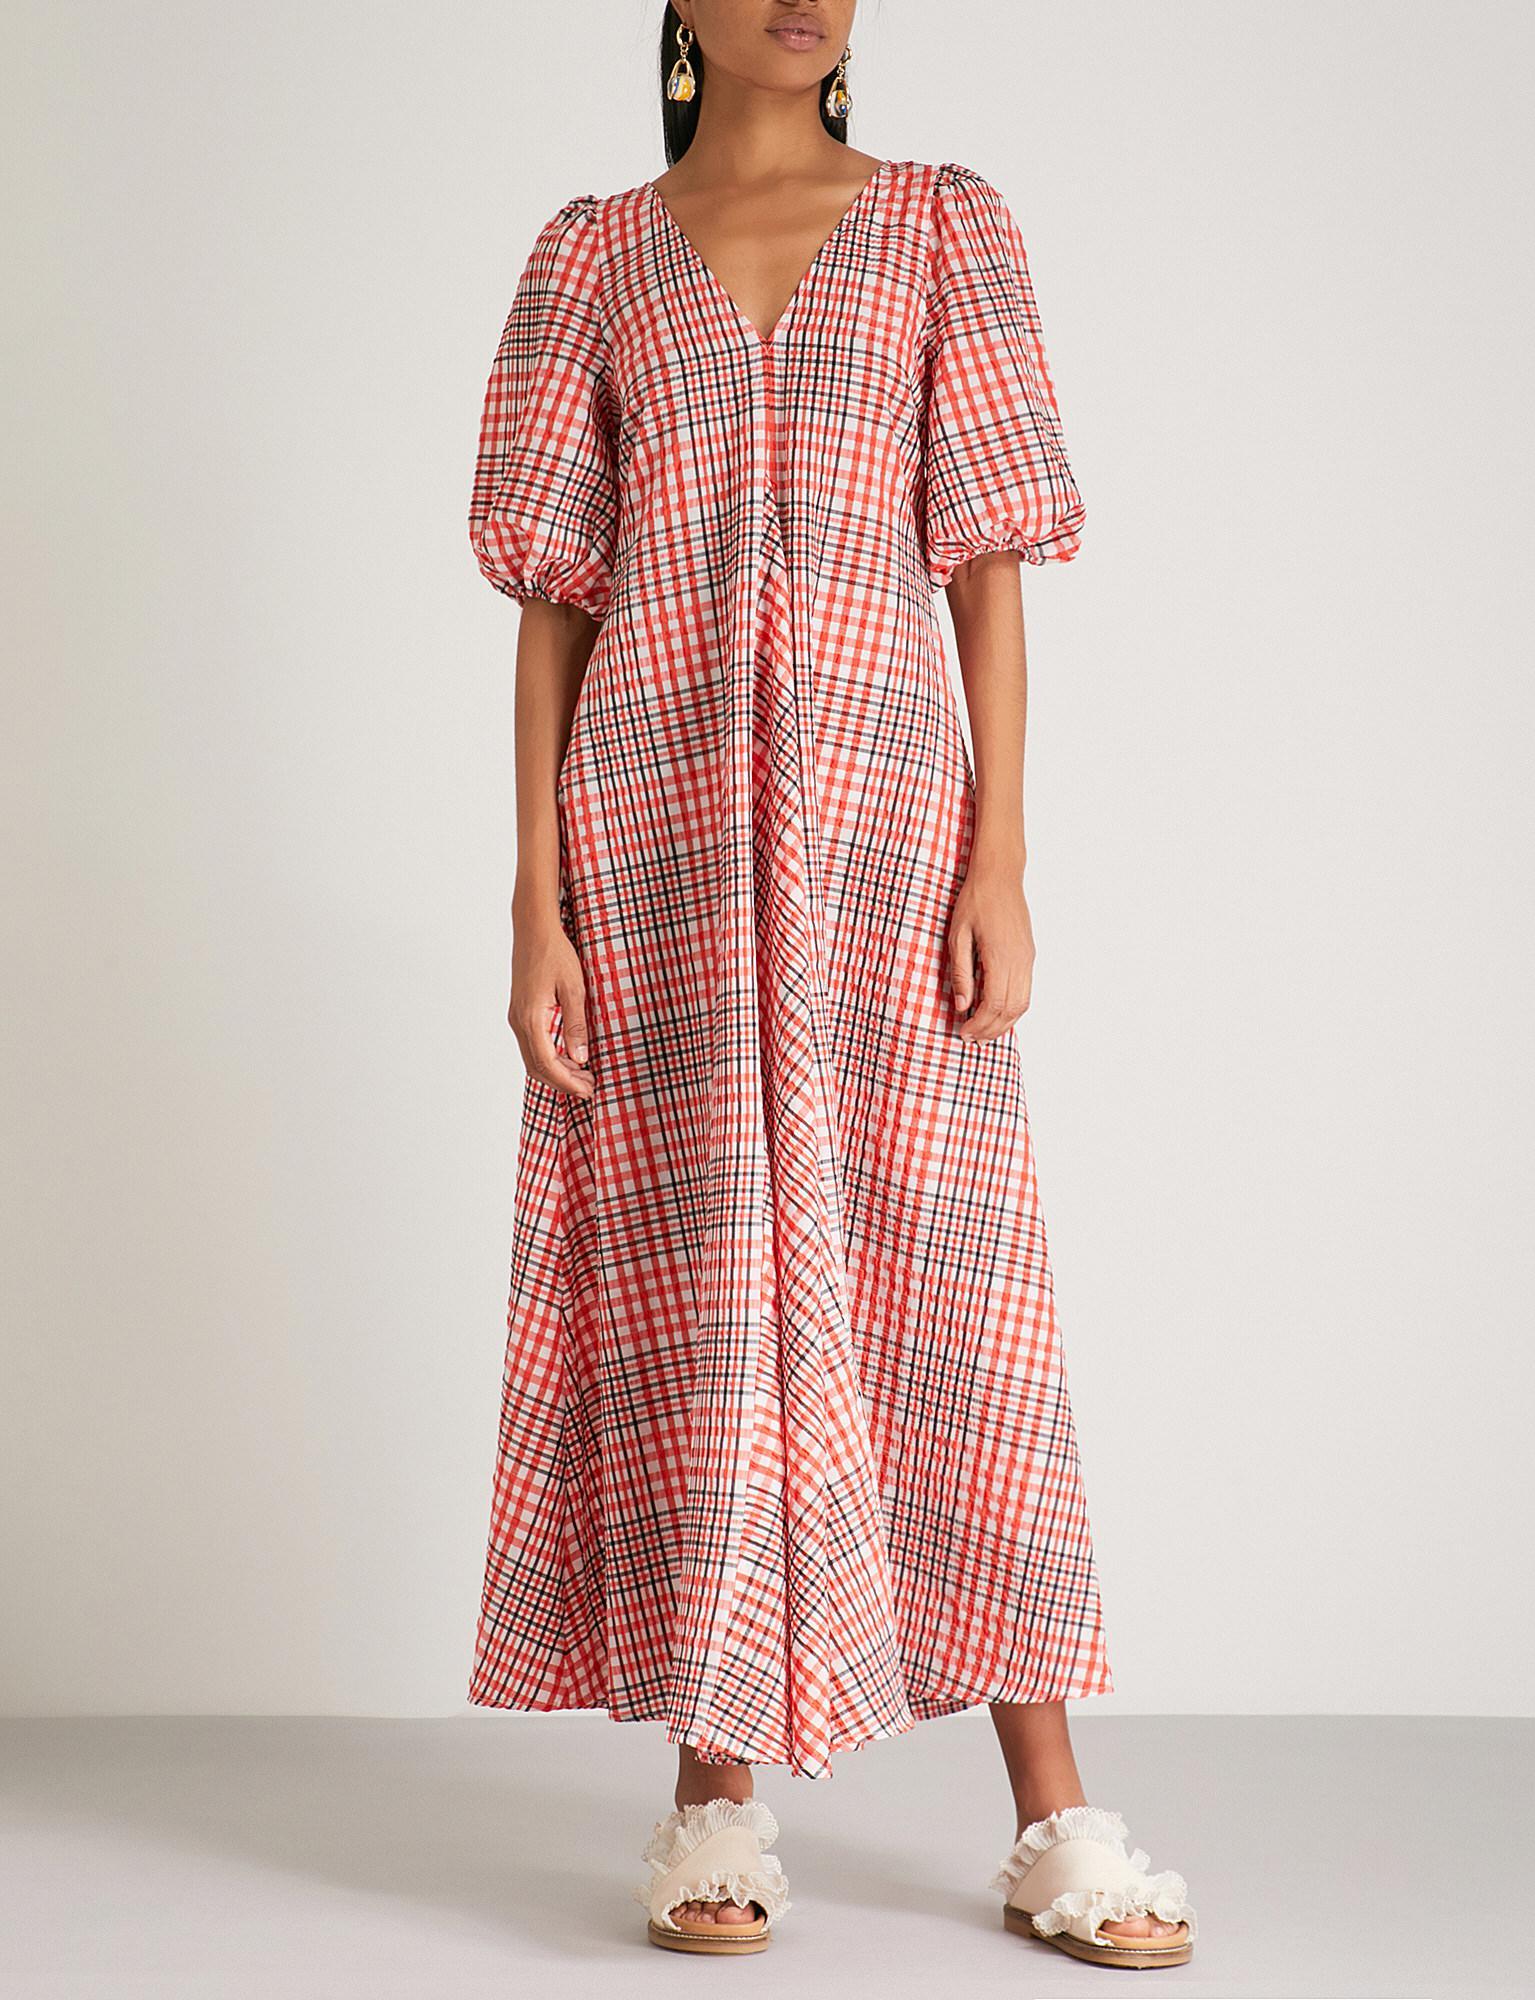 a2a3d66a Ganni Charron Cotton-blend Maxi Dress in Red - Lyst